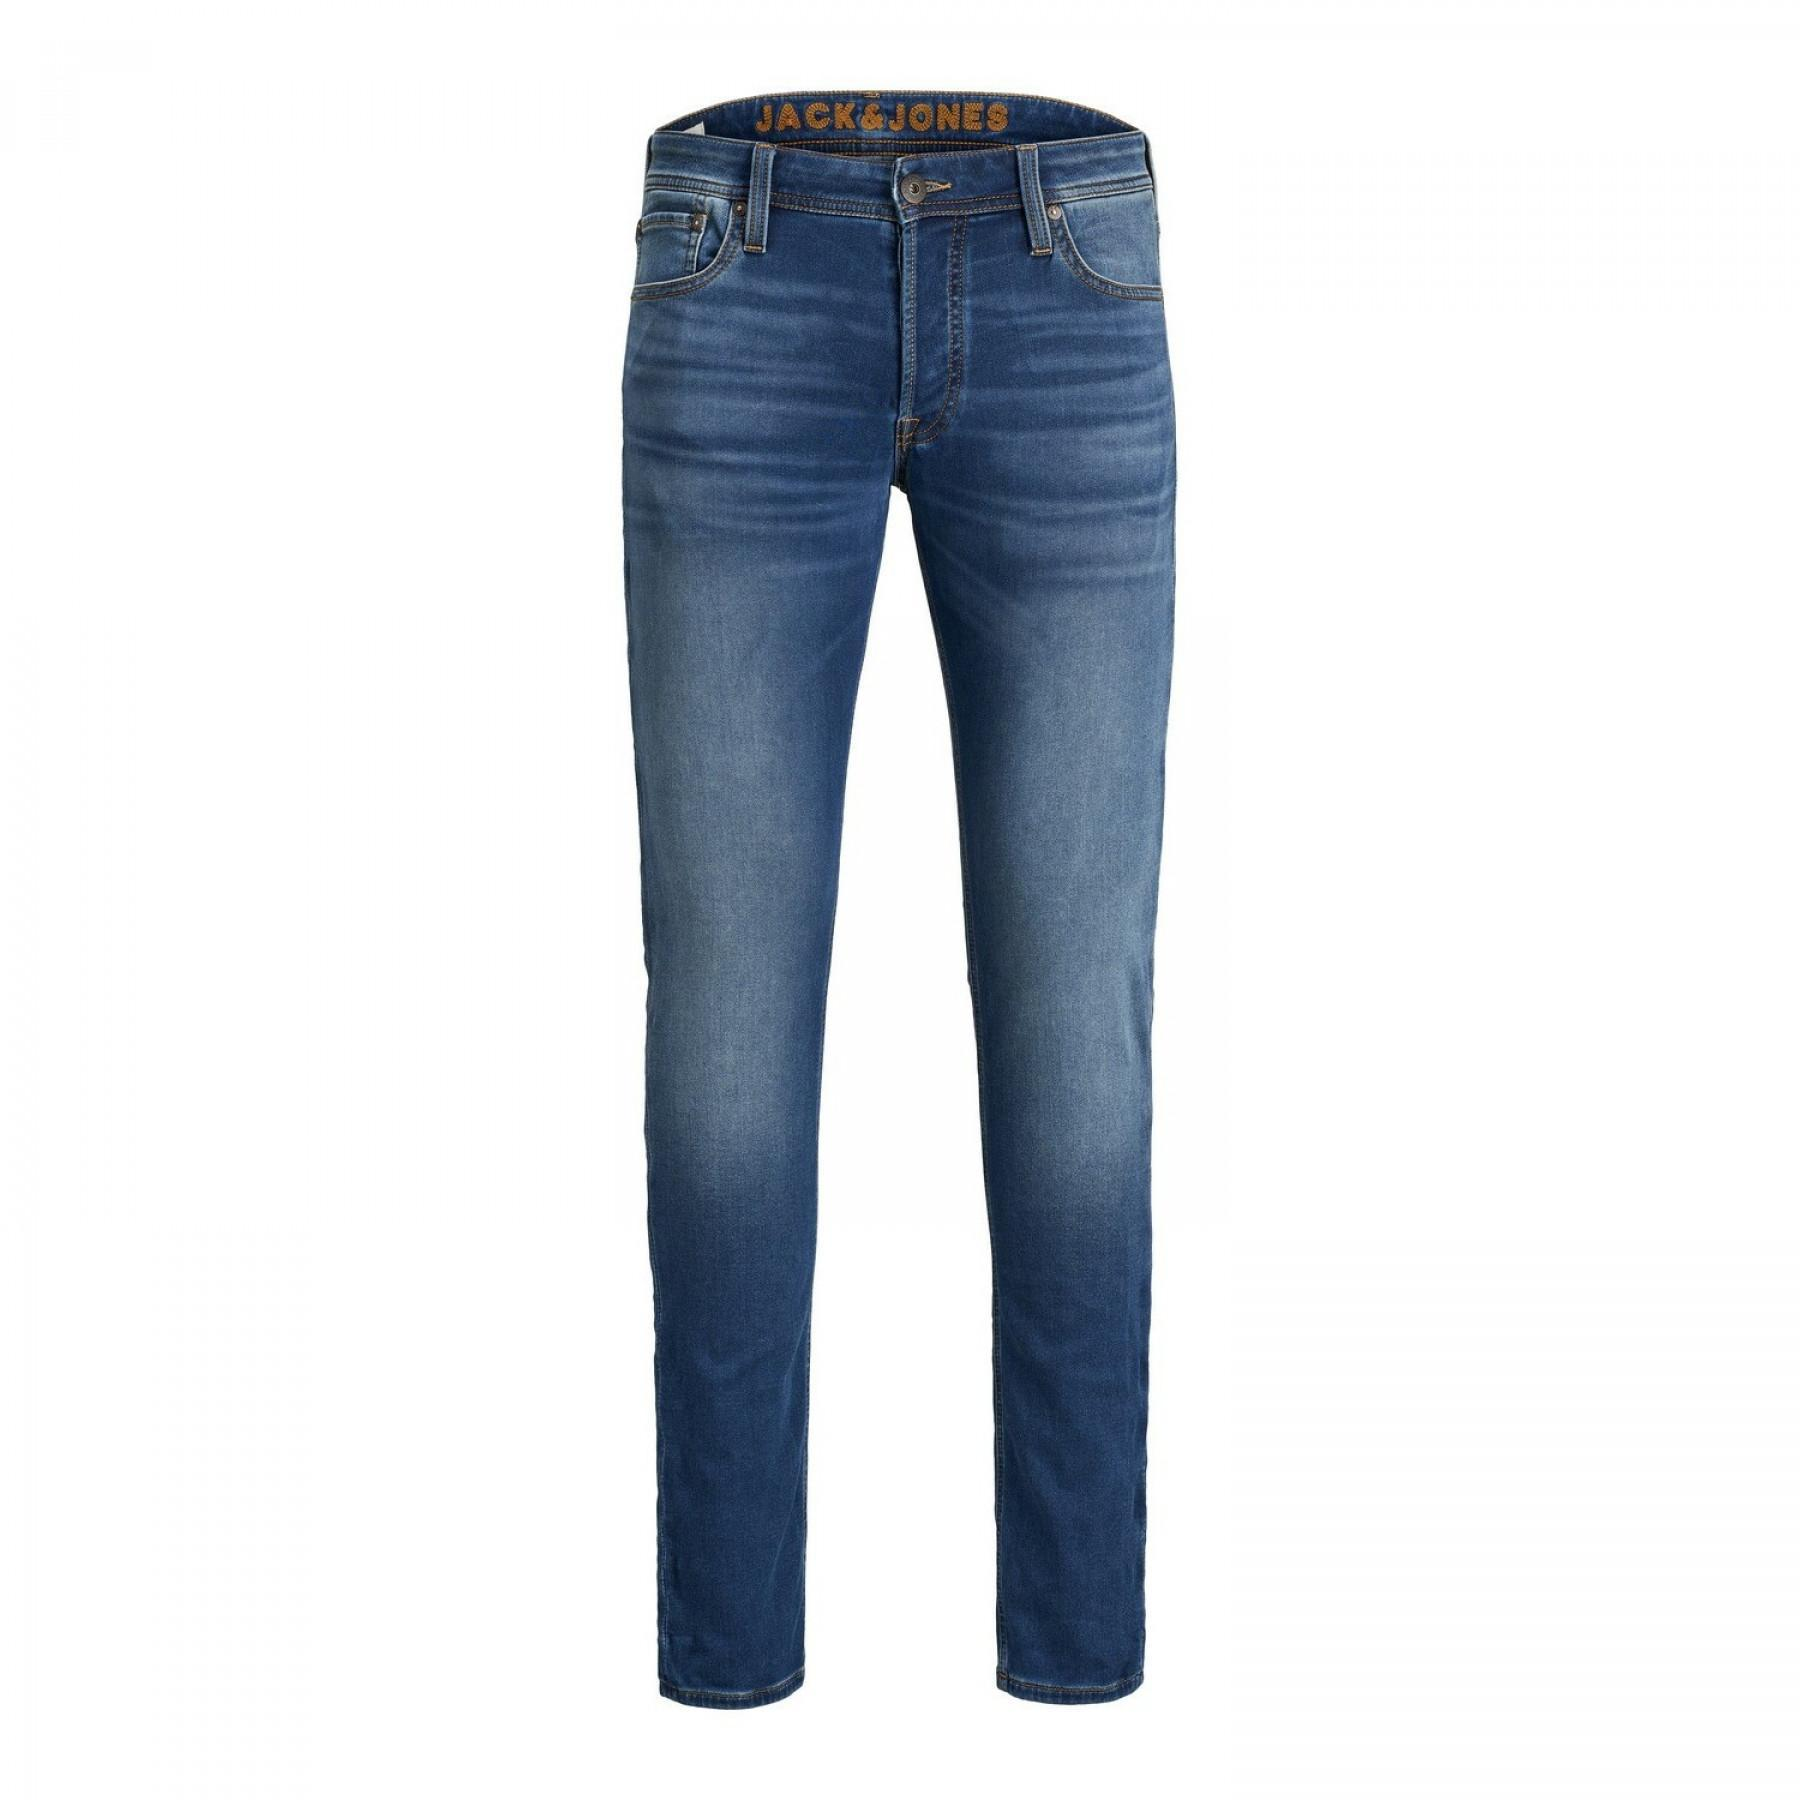 Jeans Jack & Jones Glenn Original 006